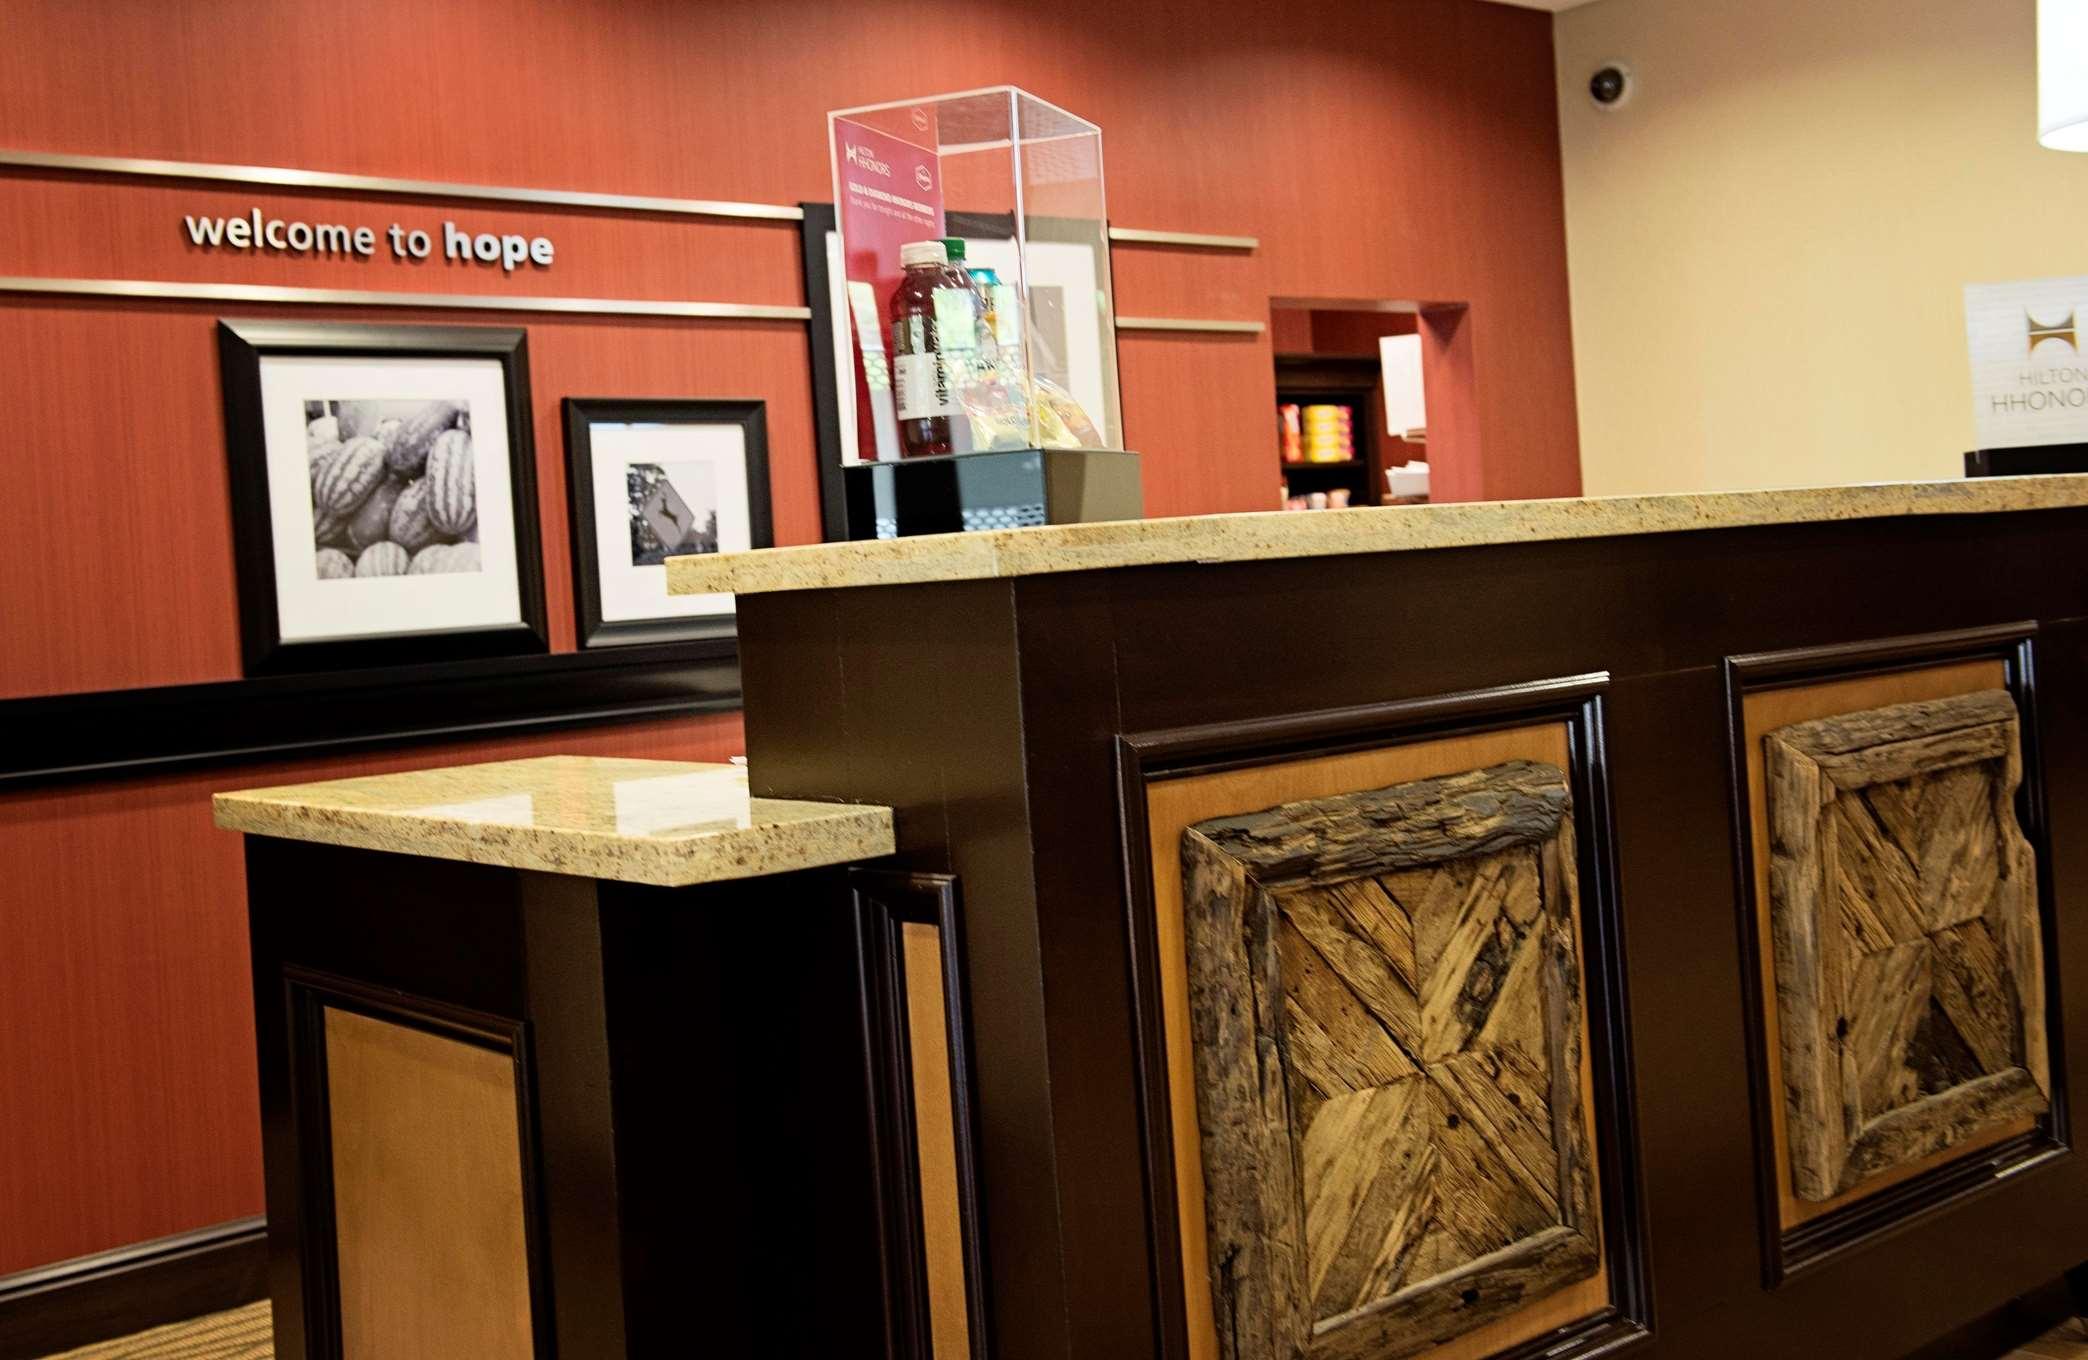 Hampton Inn & Suites Hope image 7